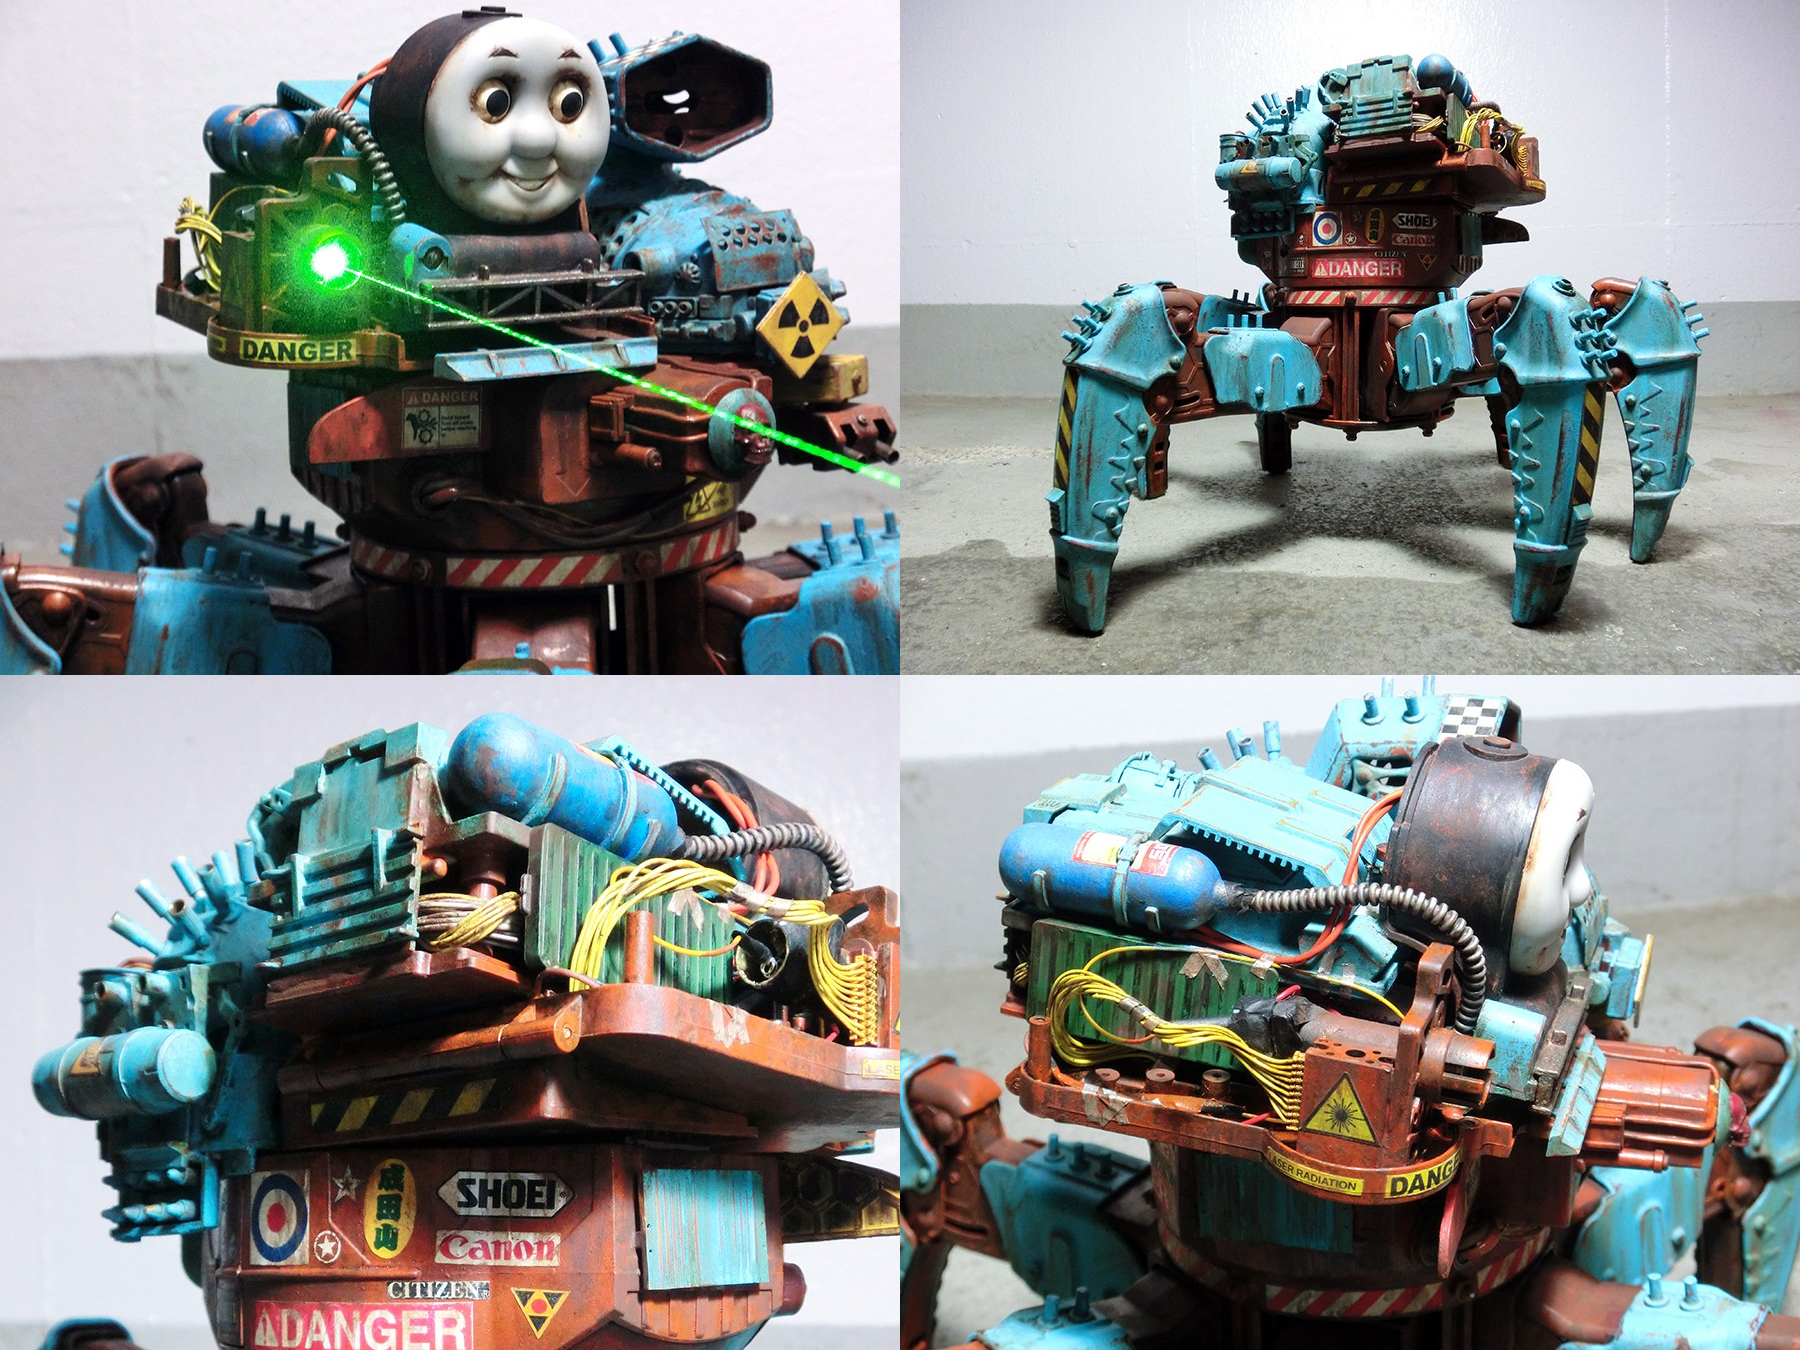 Post-Apocalyptic Thomas the Tank Engine